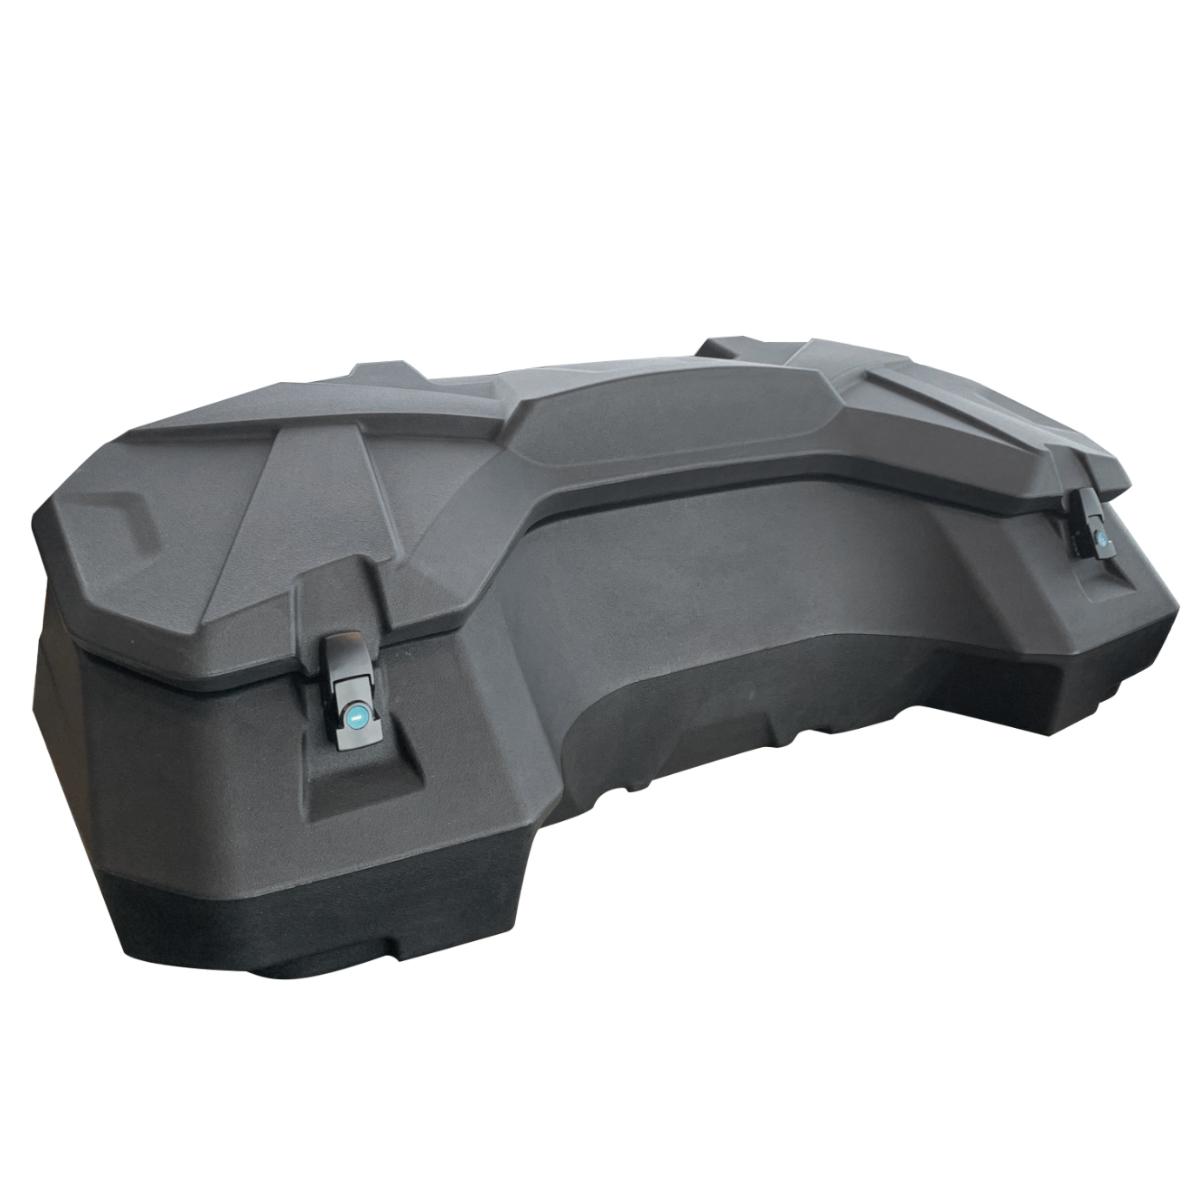 SHARK ATV cargo Box AX92